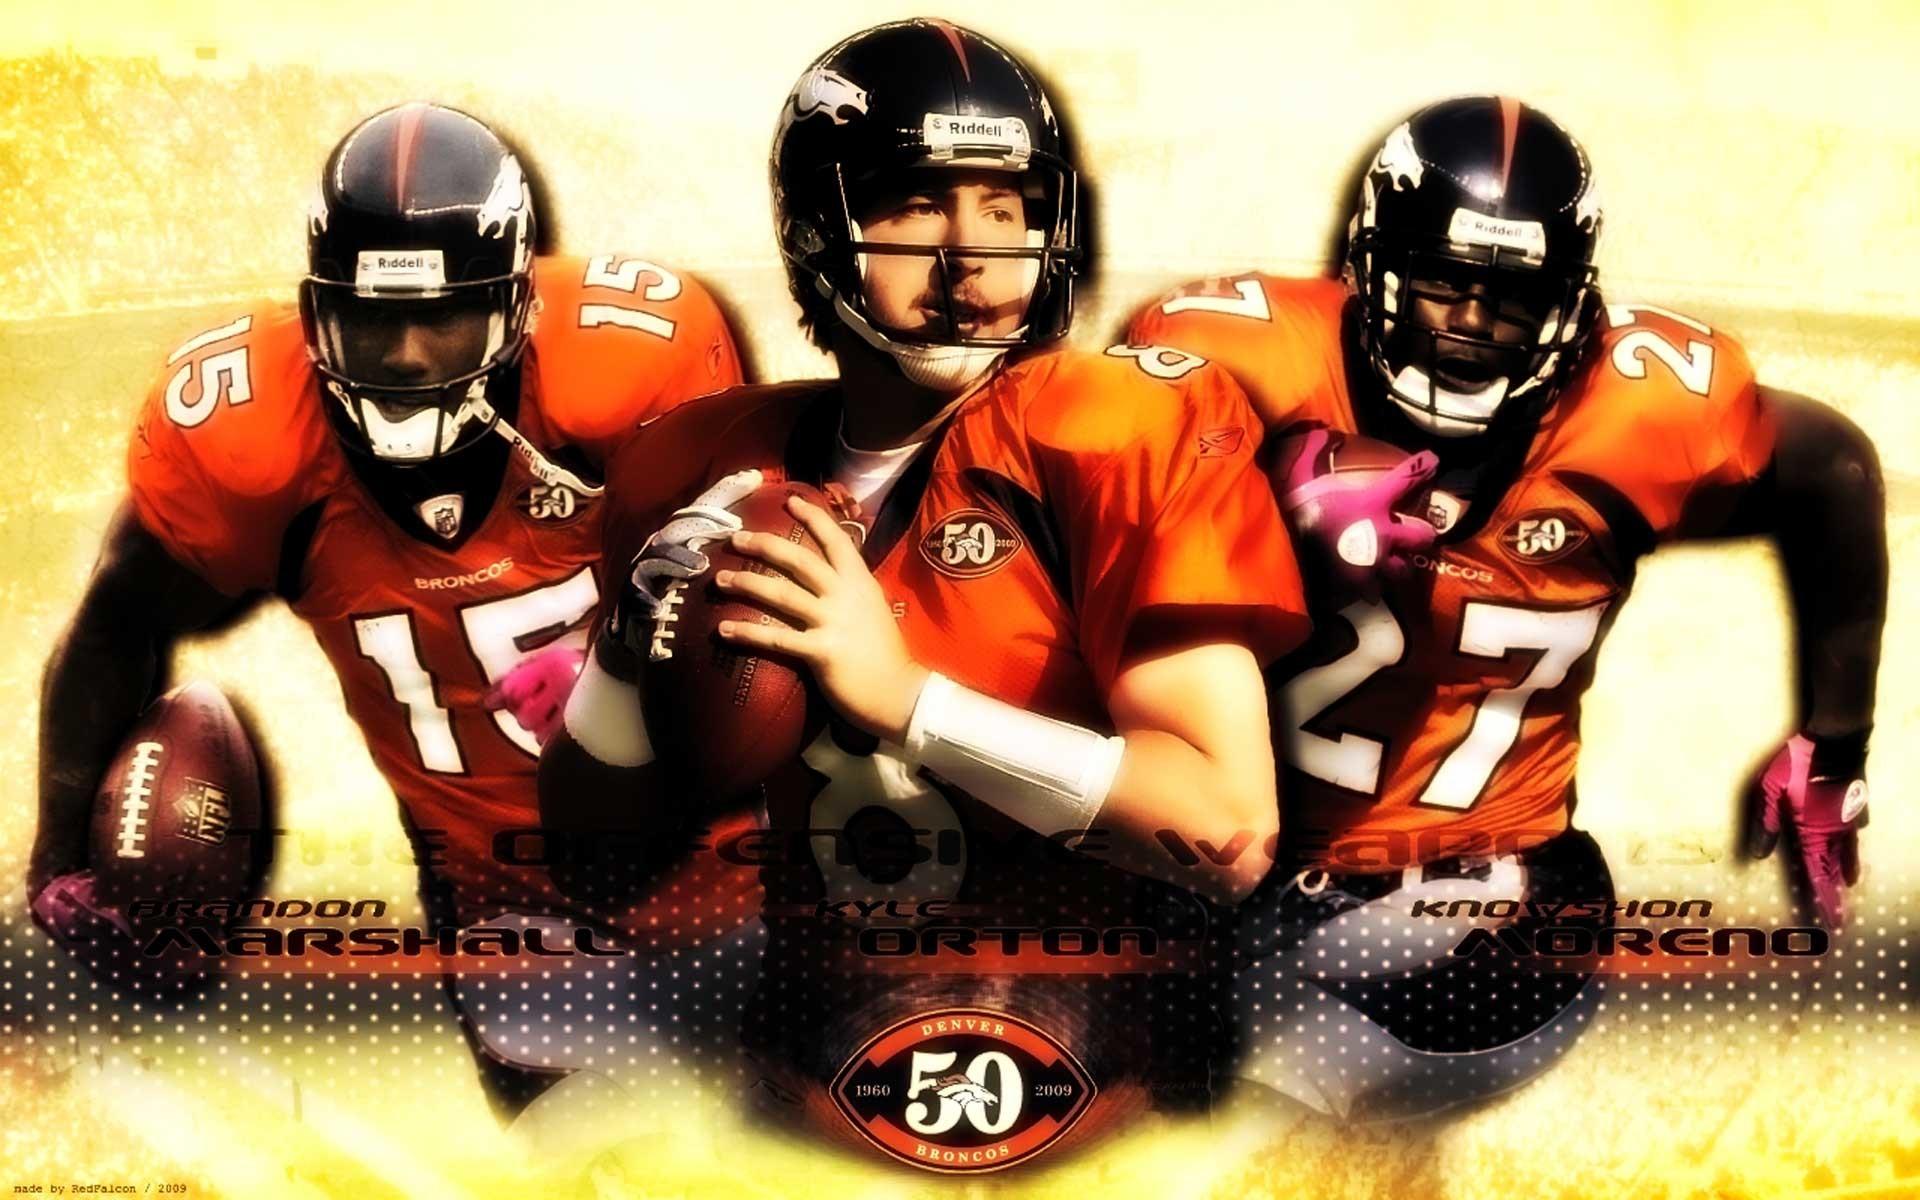 Free wallpaper of Denver broncos for IPad   Denver Broncos wallpaper HD  images   Denver Broncos